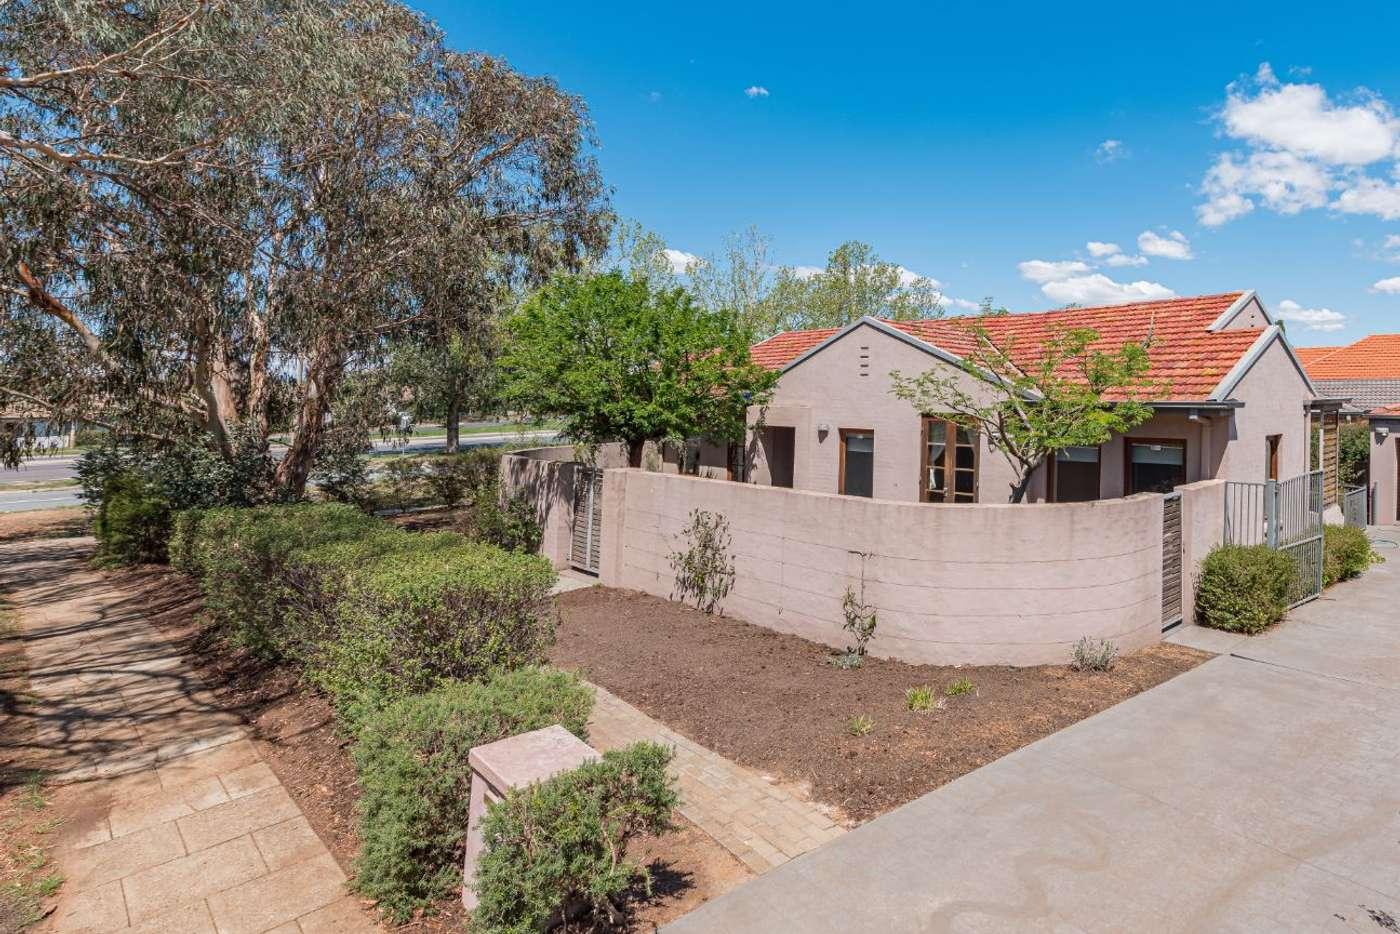 Main view of Homely house listing, 30 McMillan Crescent, Narrabundah ACT 2604